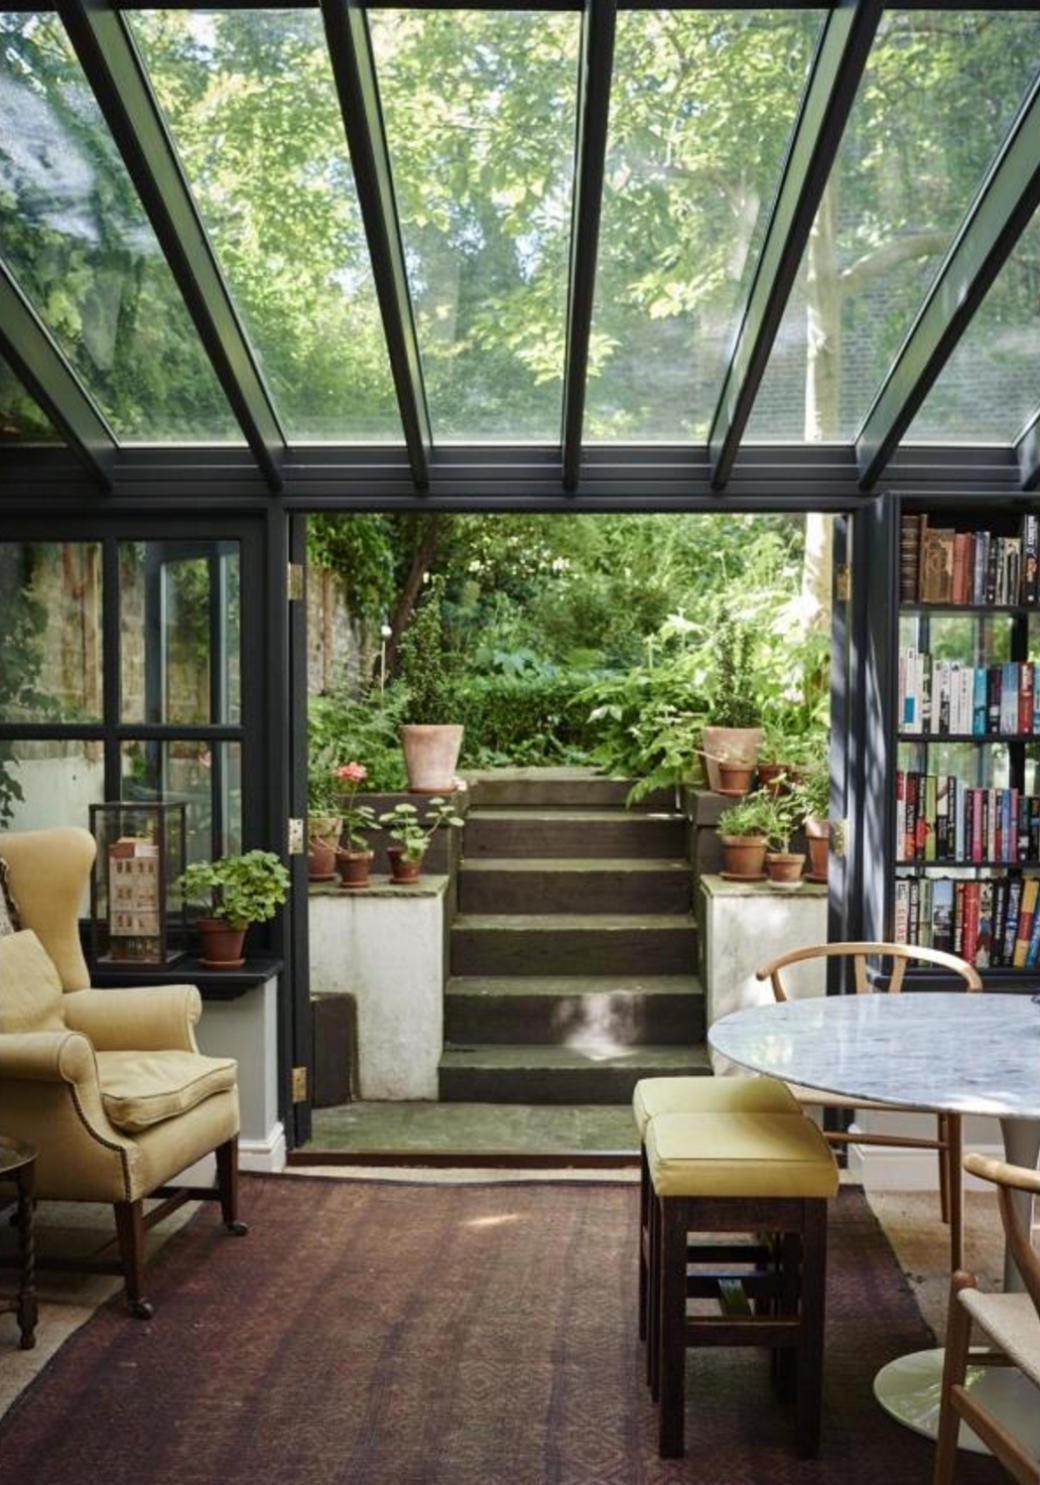 Window ideas for a sunroom  garden apartment  sunrooms decks u patios  pinterest